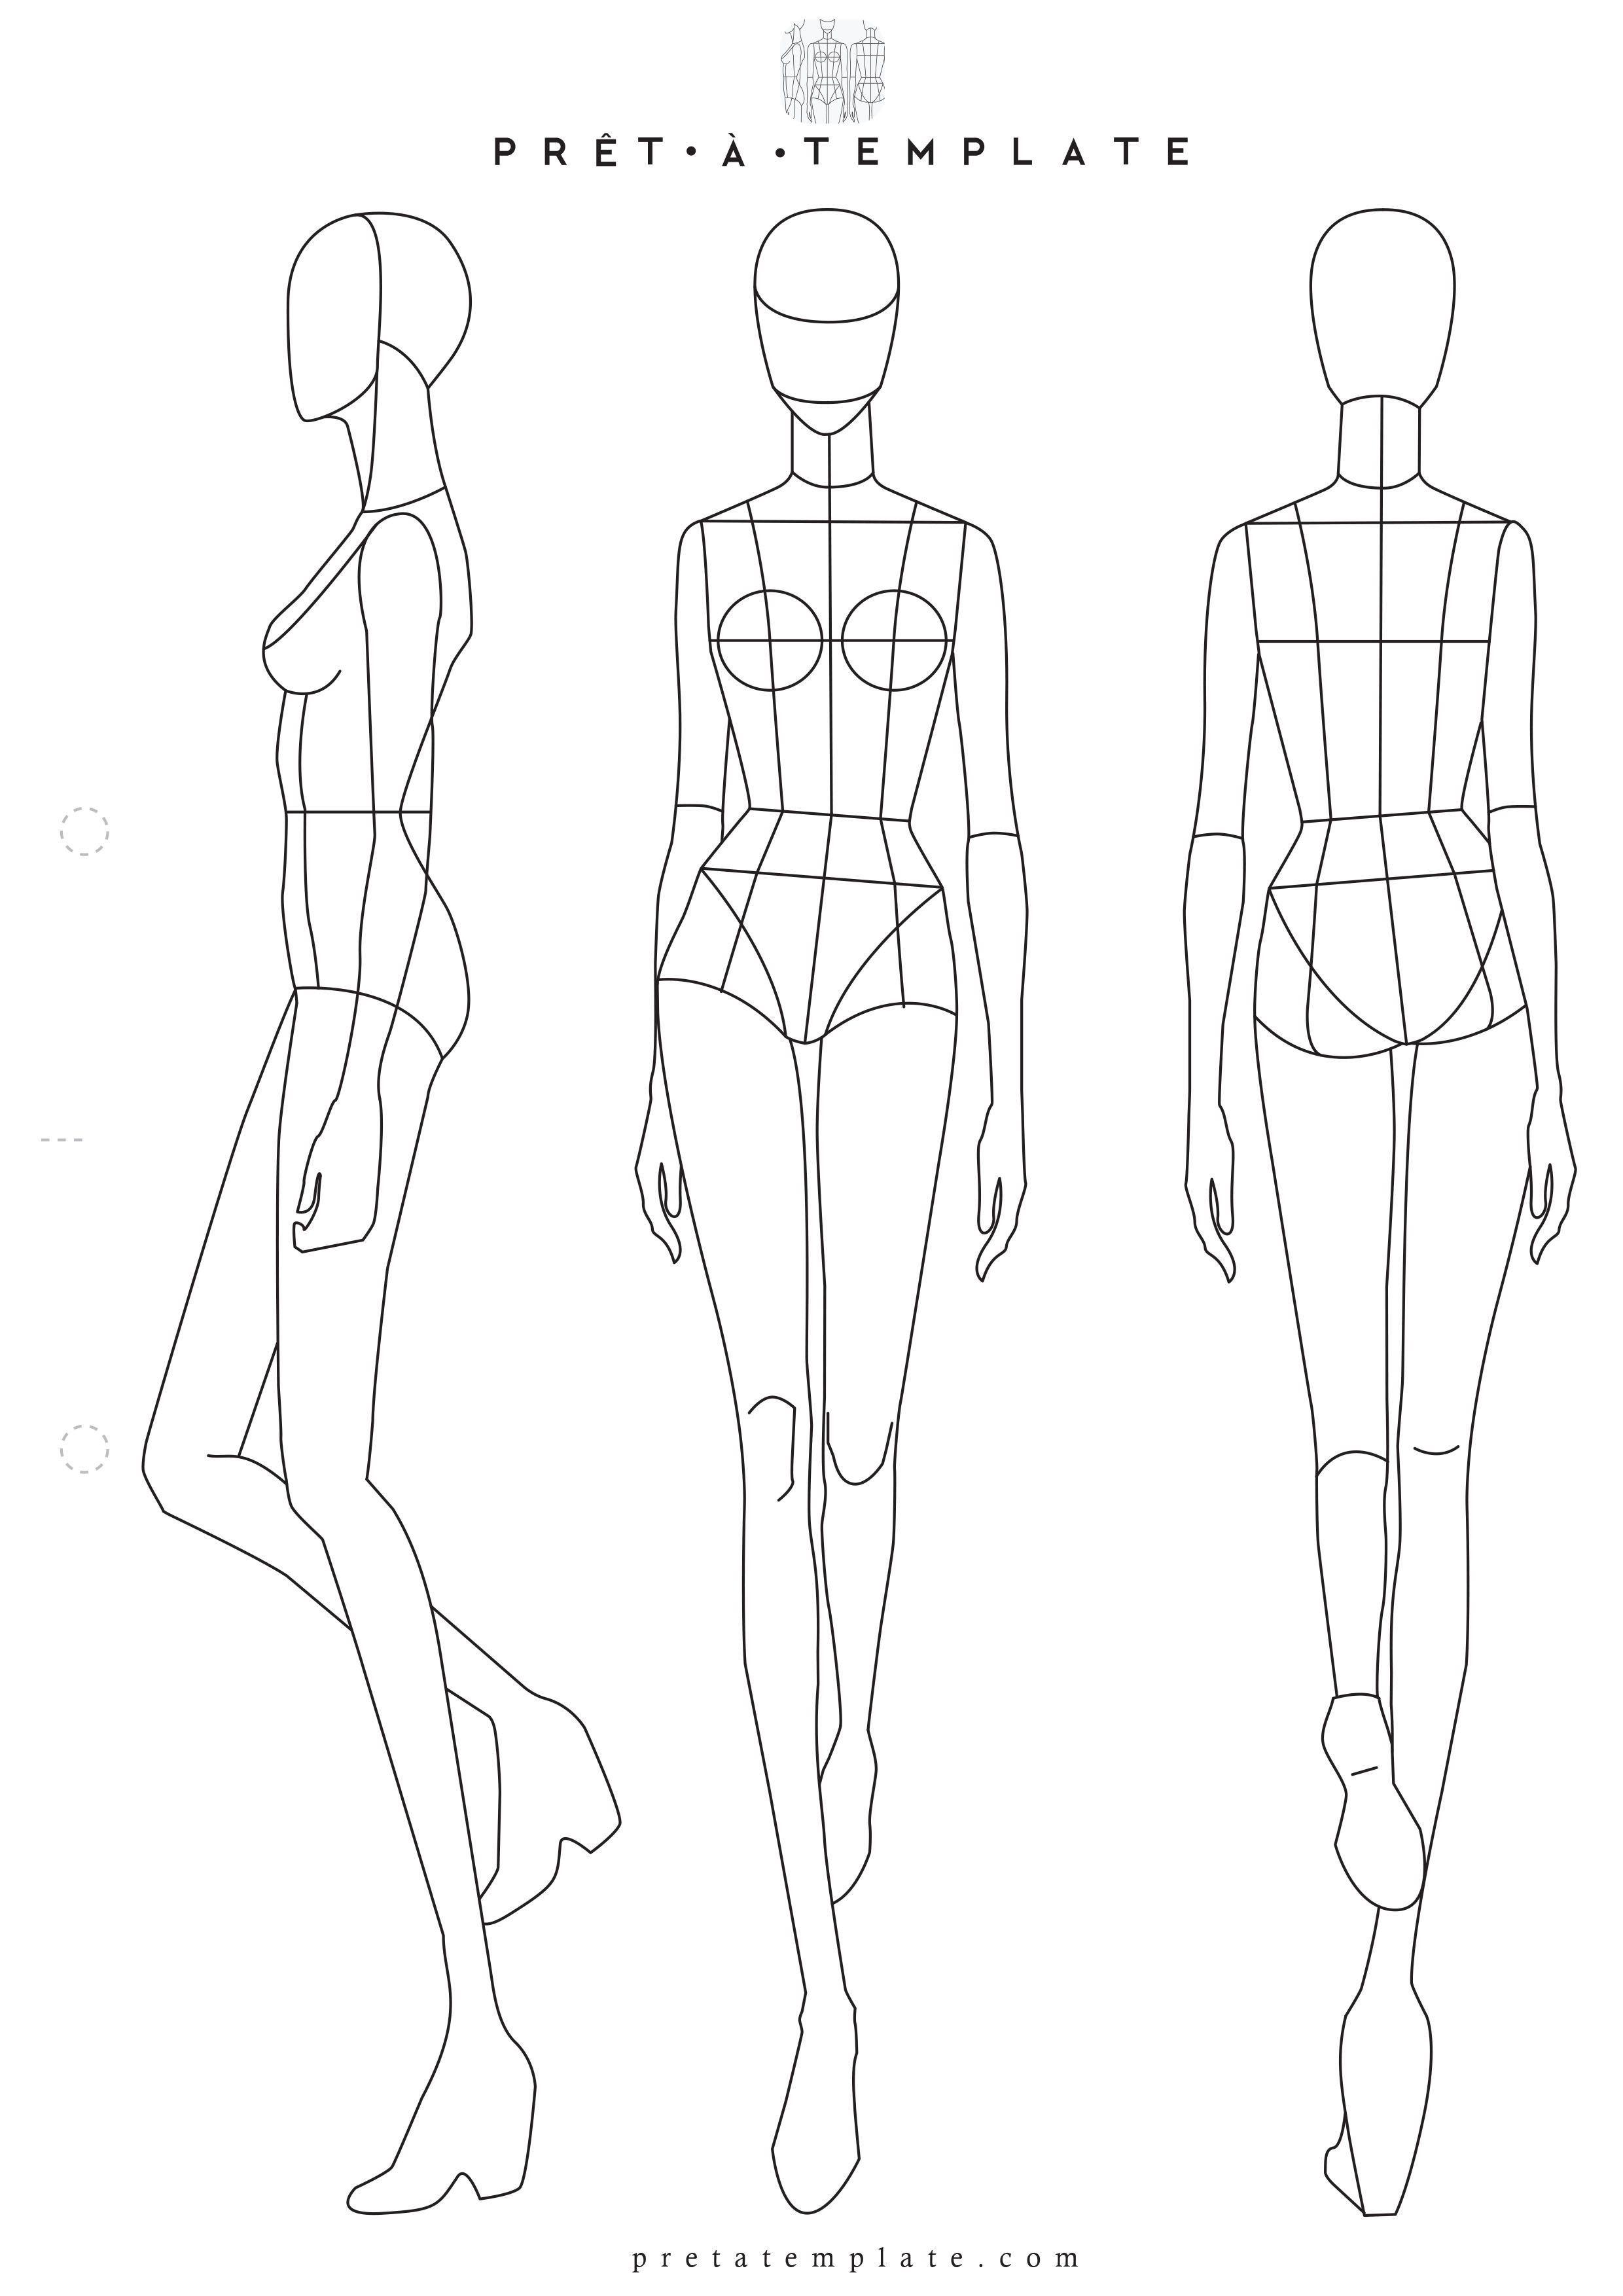 004 Fantastic Body Template For Fashion Design Photo  Female Male HumanFull